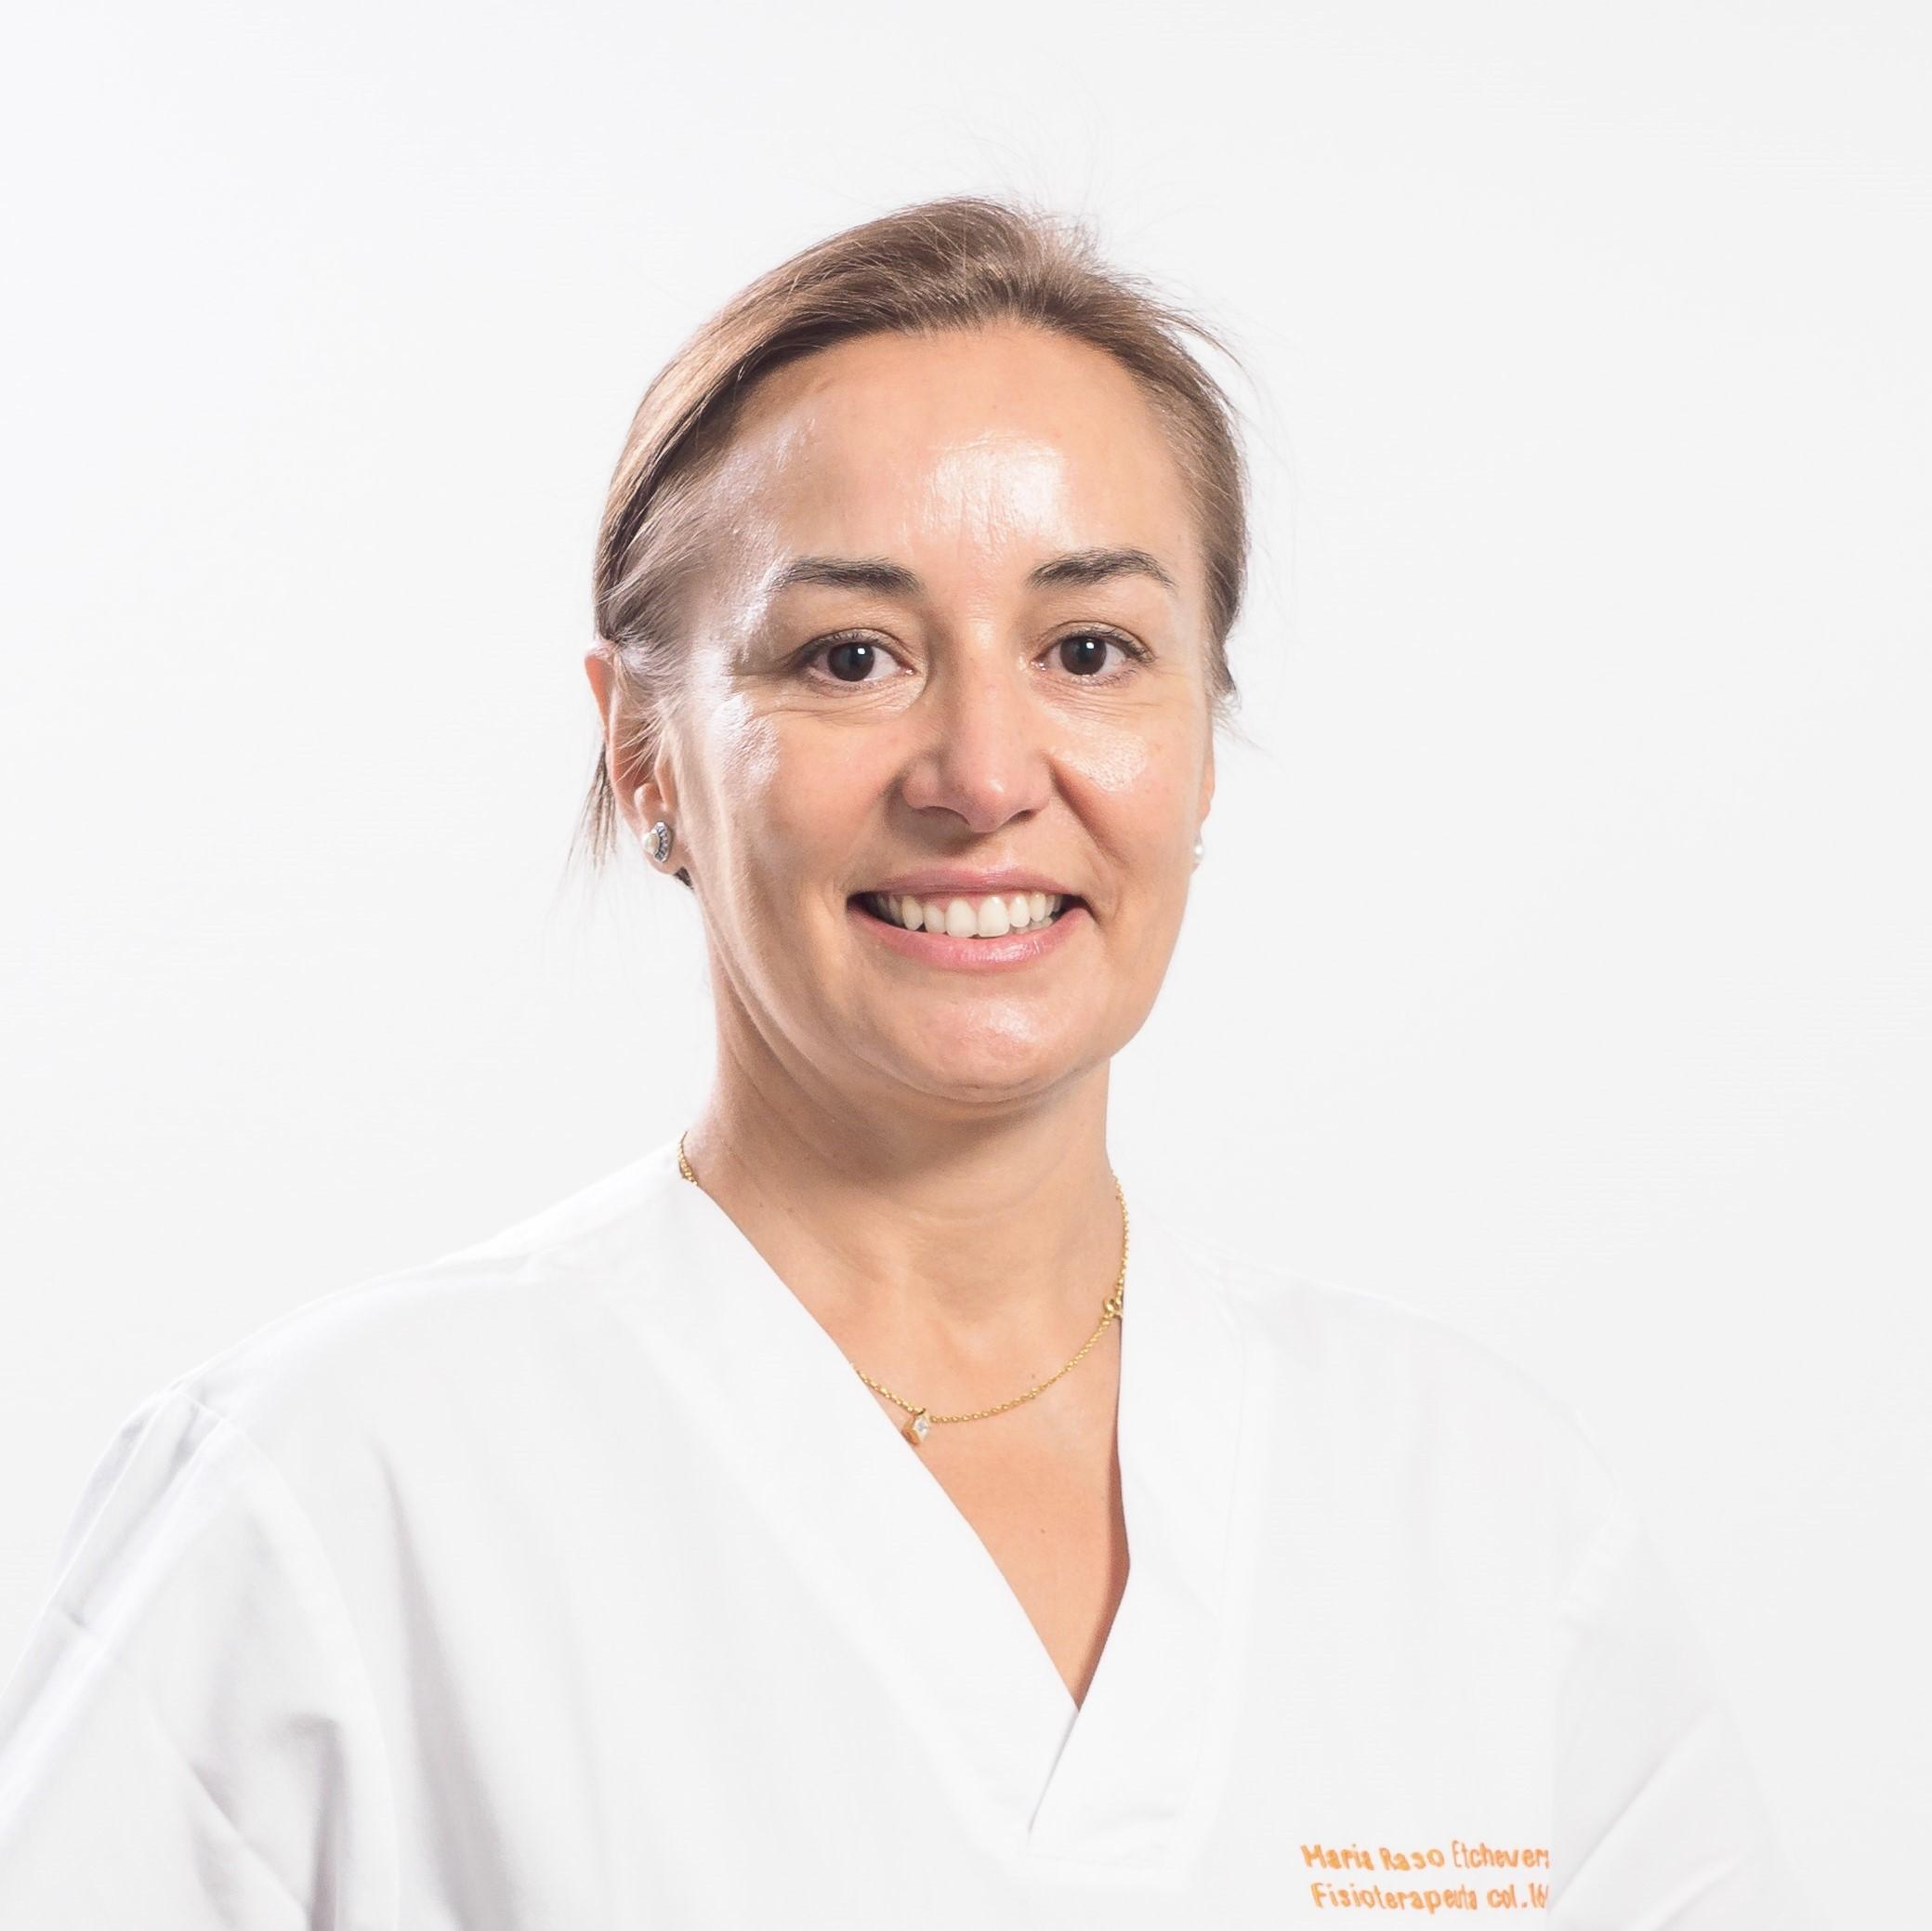 María Raso Etchevers fisioterapia